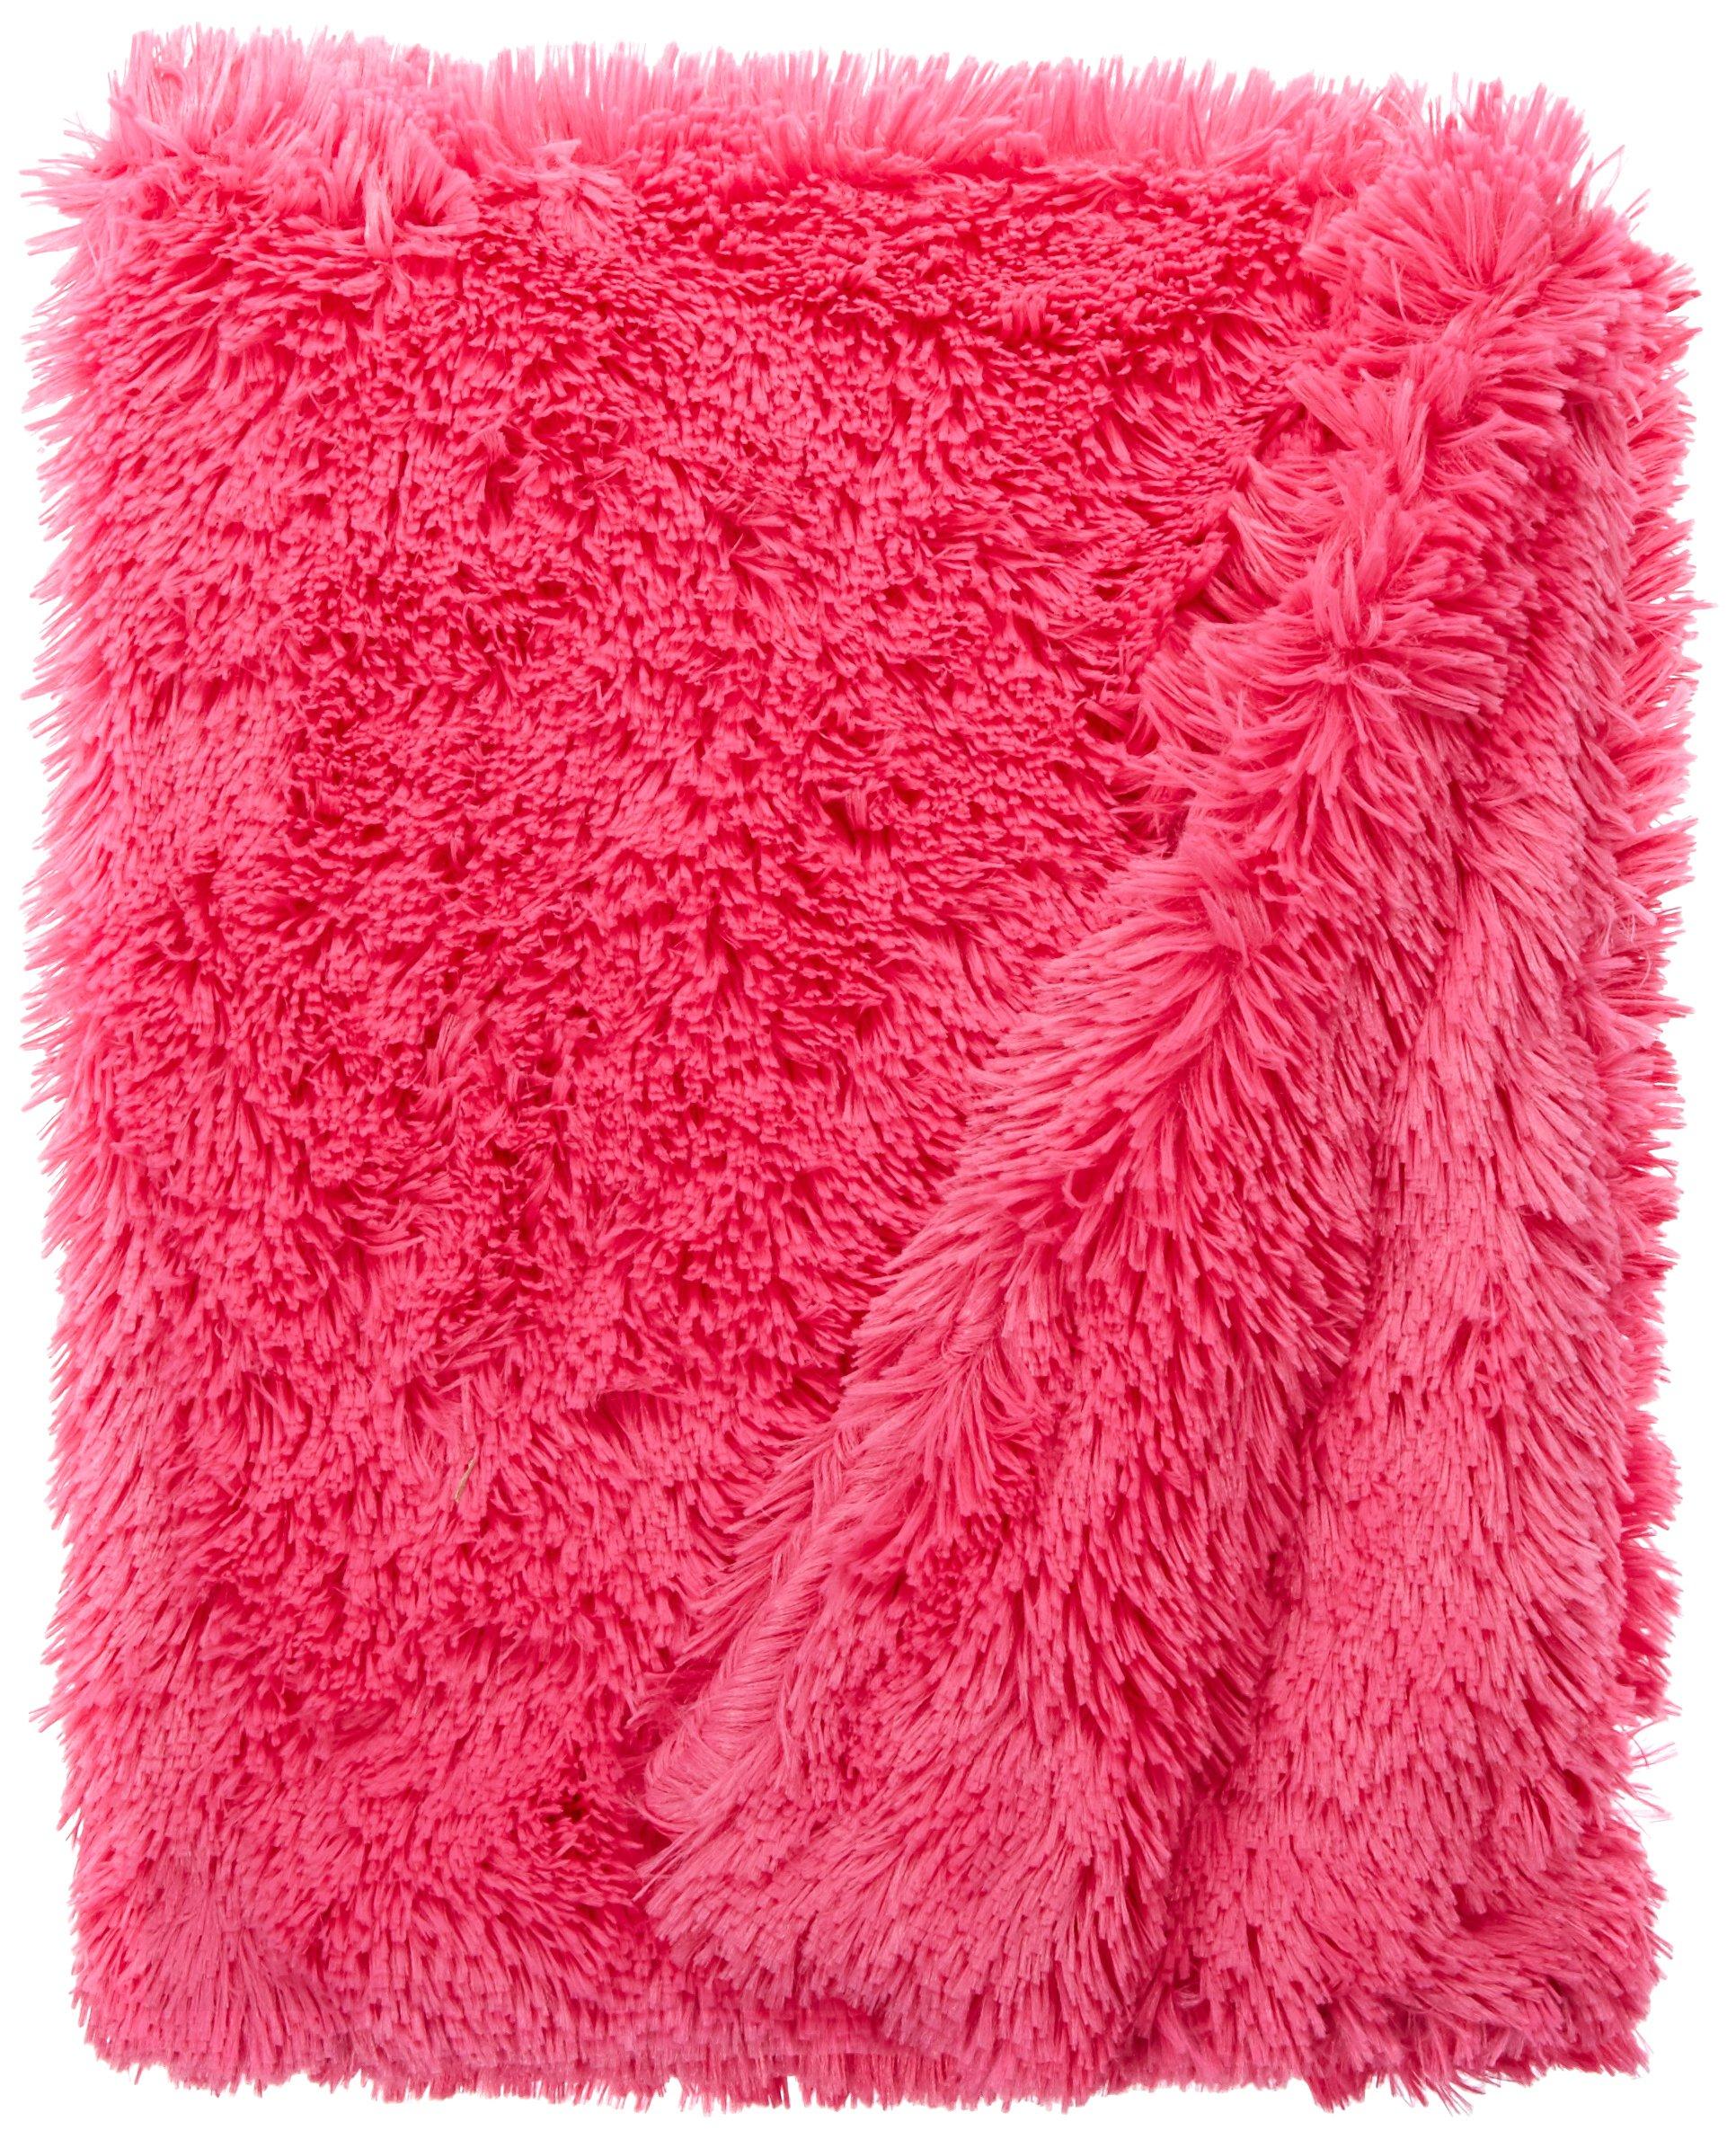 BESSIE AND BARNIE Lollipop Luxury Shag Ultra Plush Faux Fur Pet, Dog, Cat, Puppy Super Soft Reversible Blanket (Multiple Sizes)